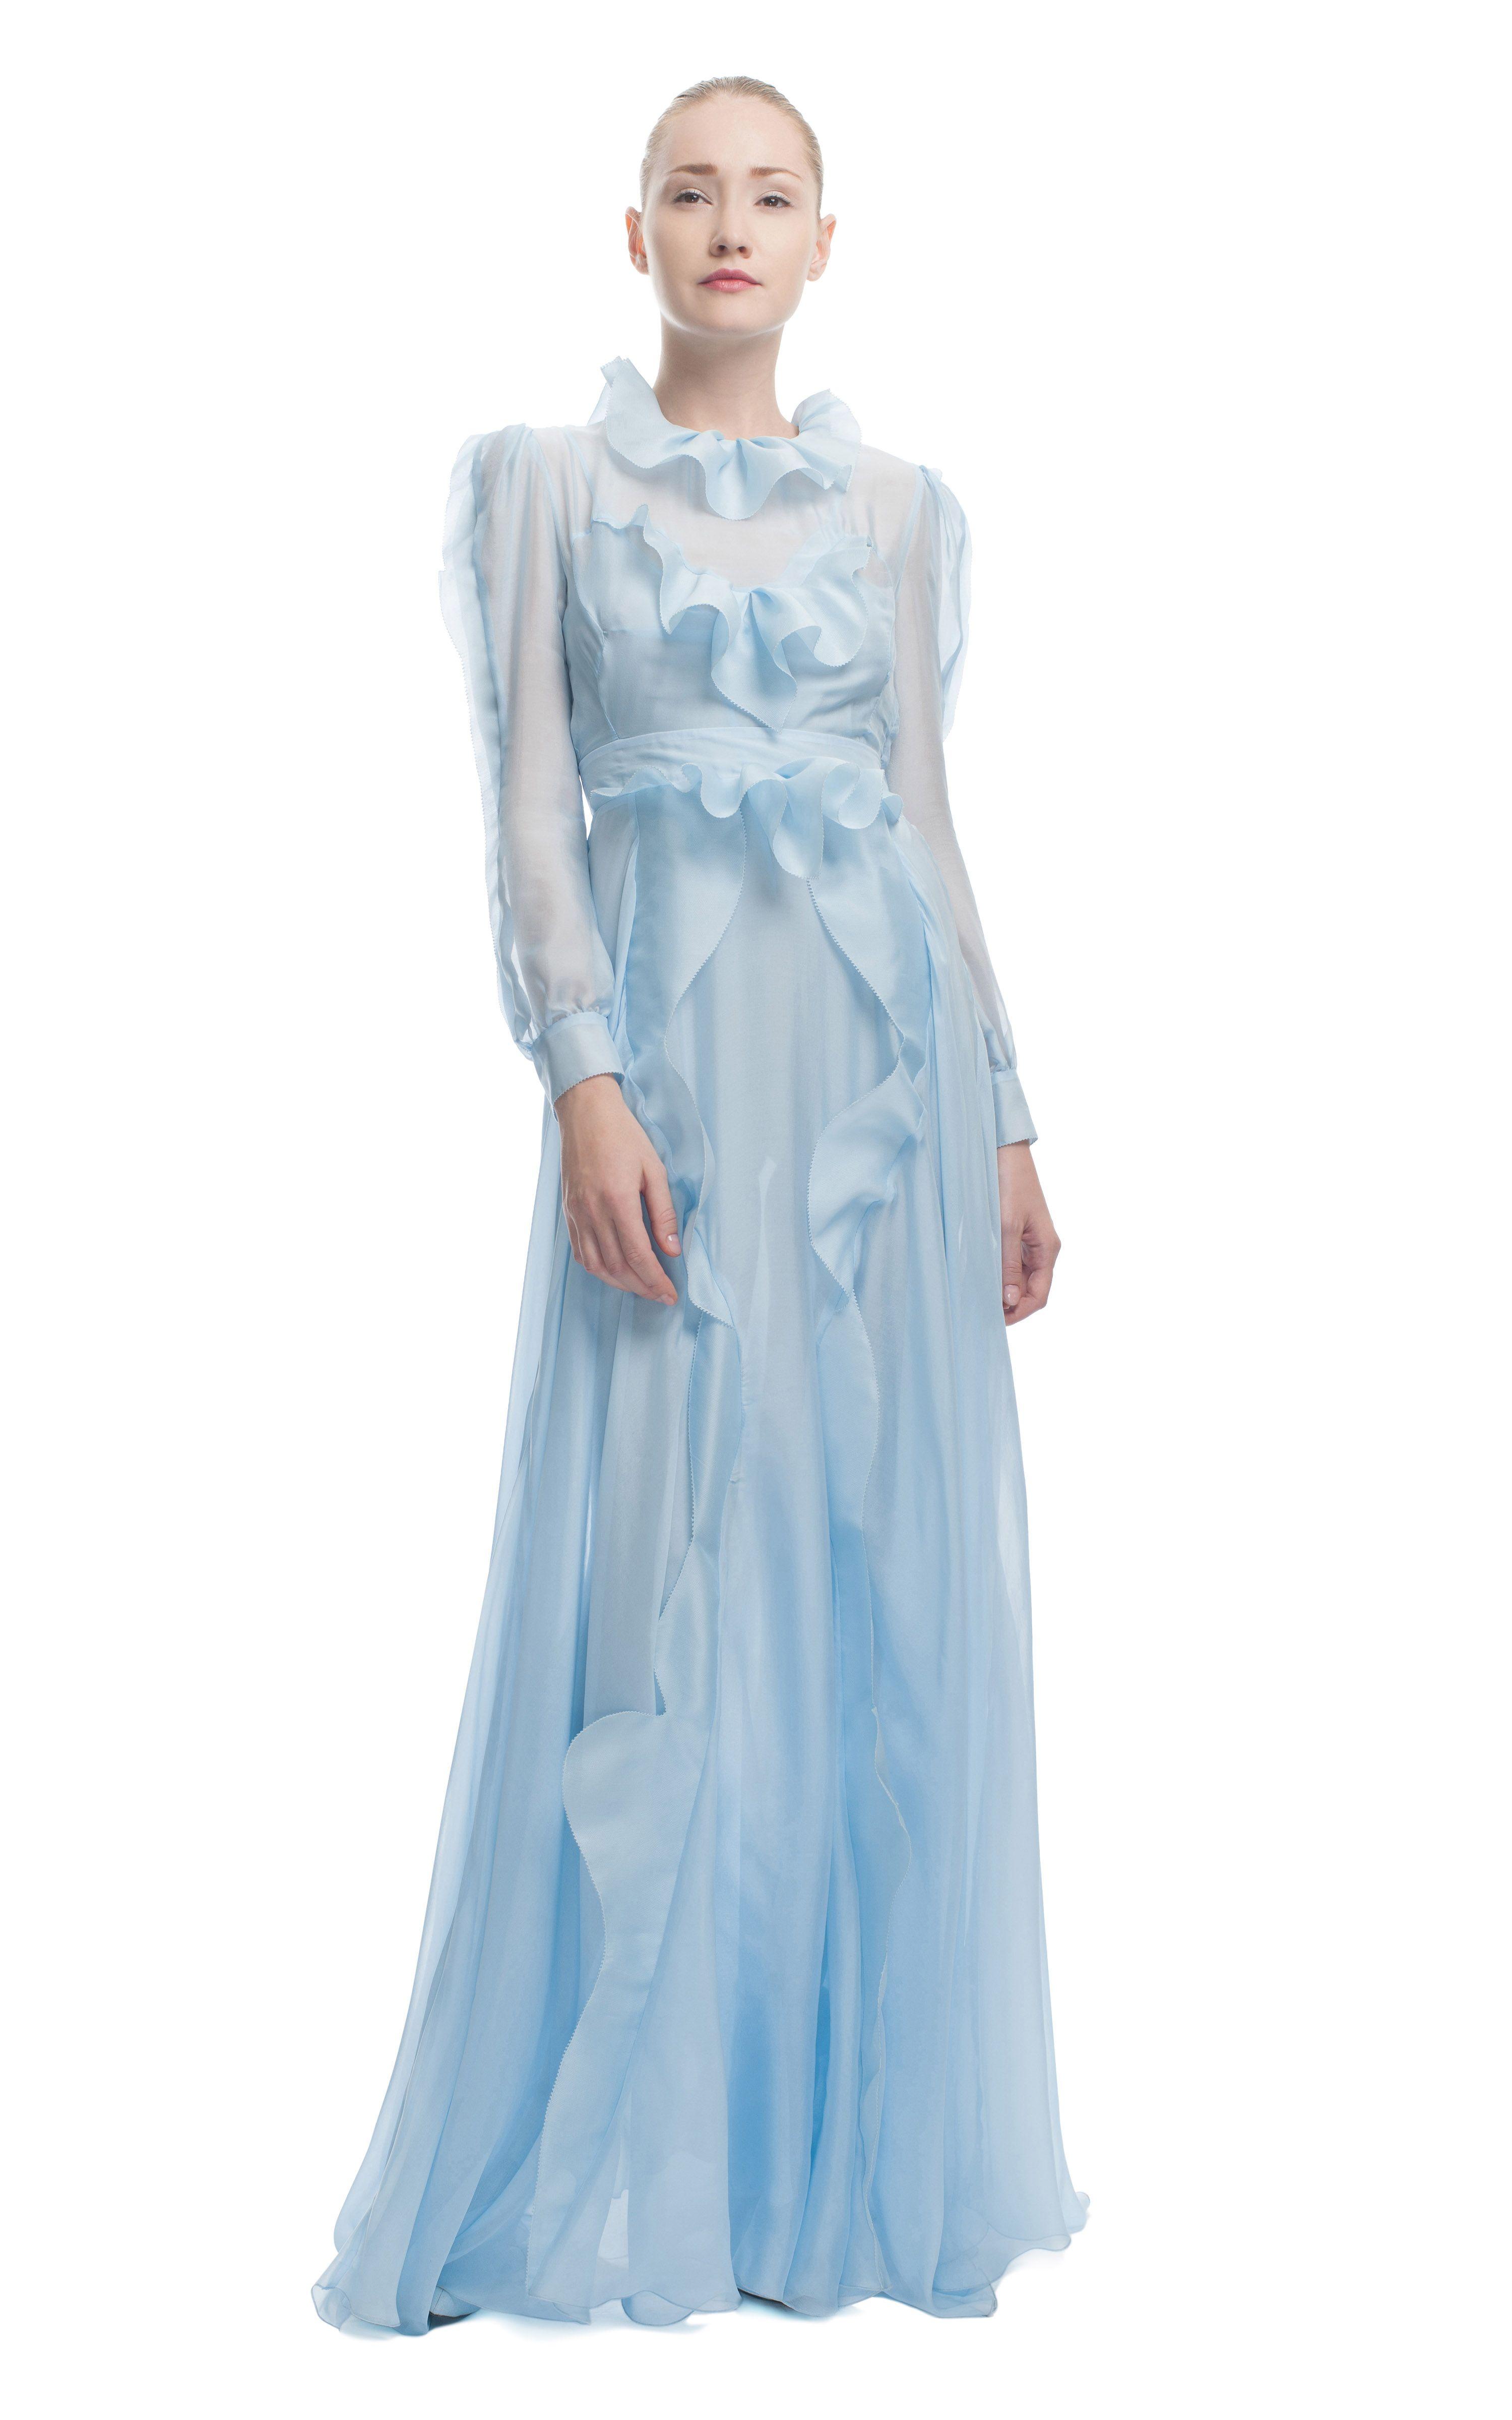 16+ Ruffle wedding dress with sleeves ideas